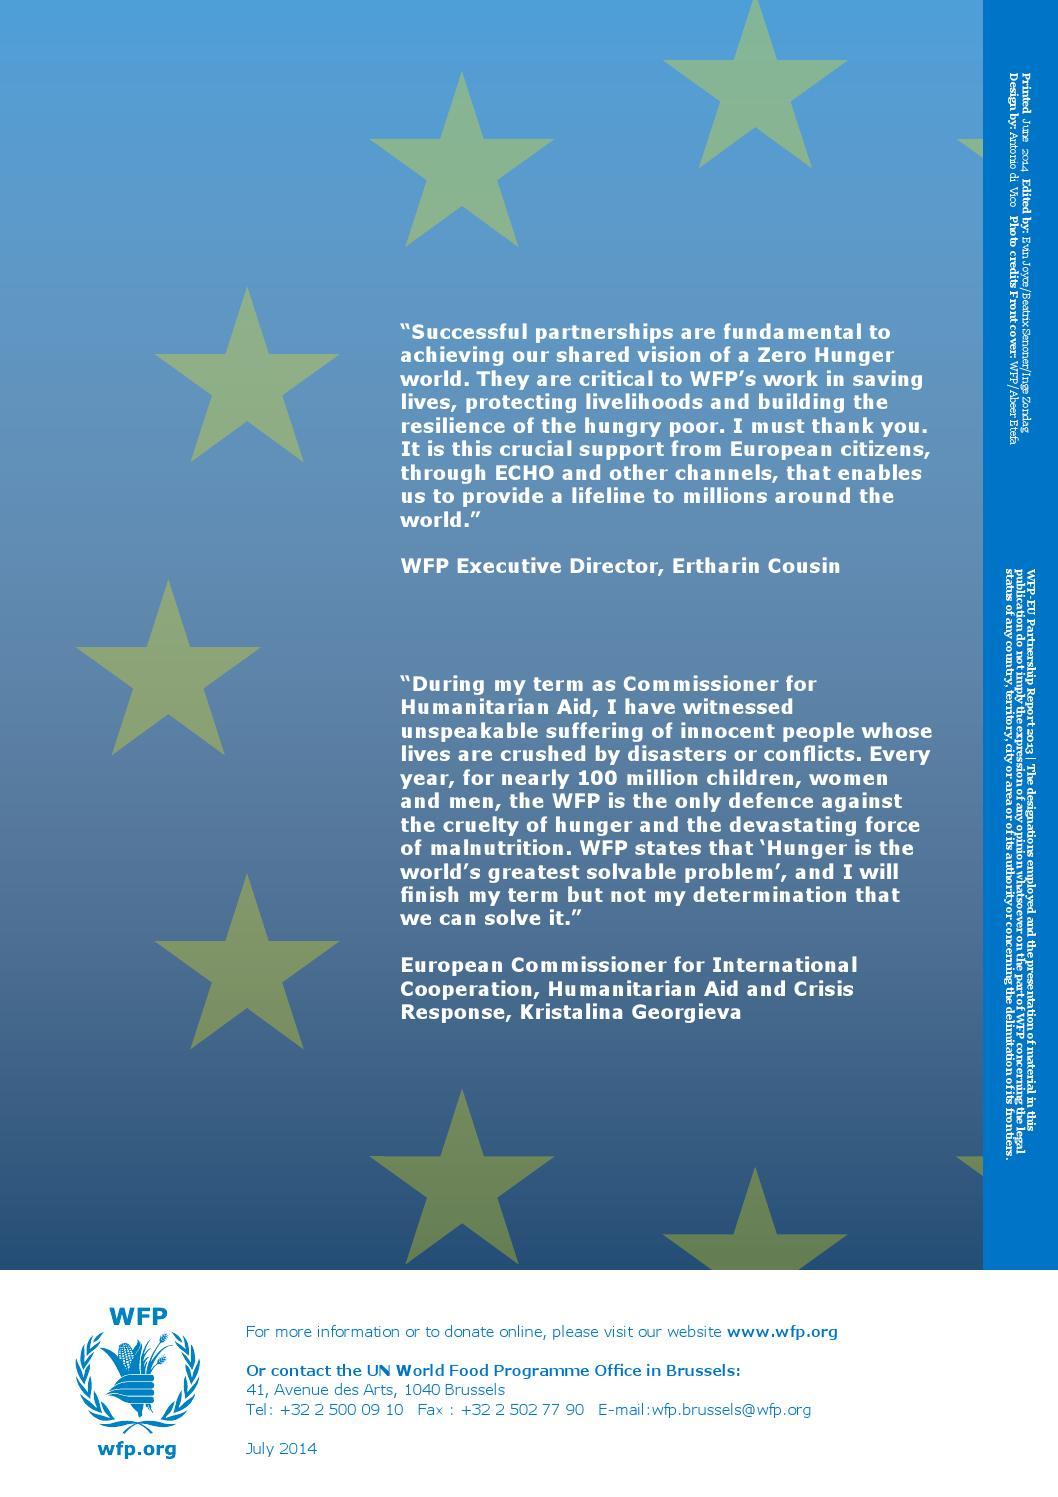 2013 wfp eu brochure by United Nations - issuu